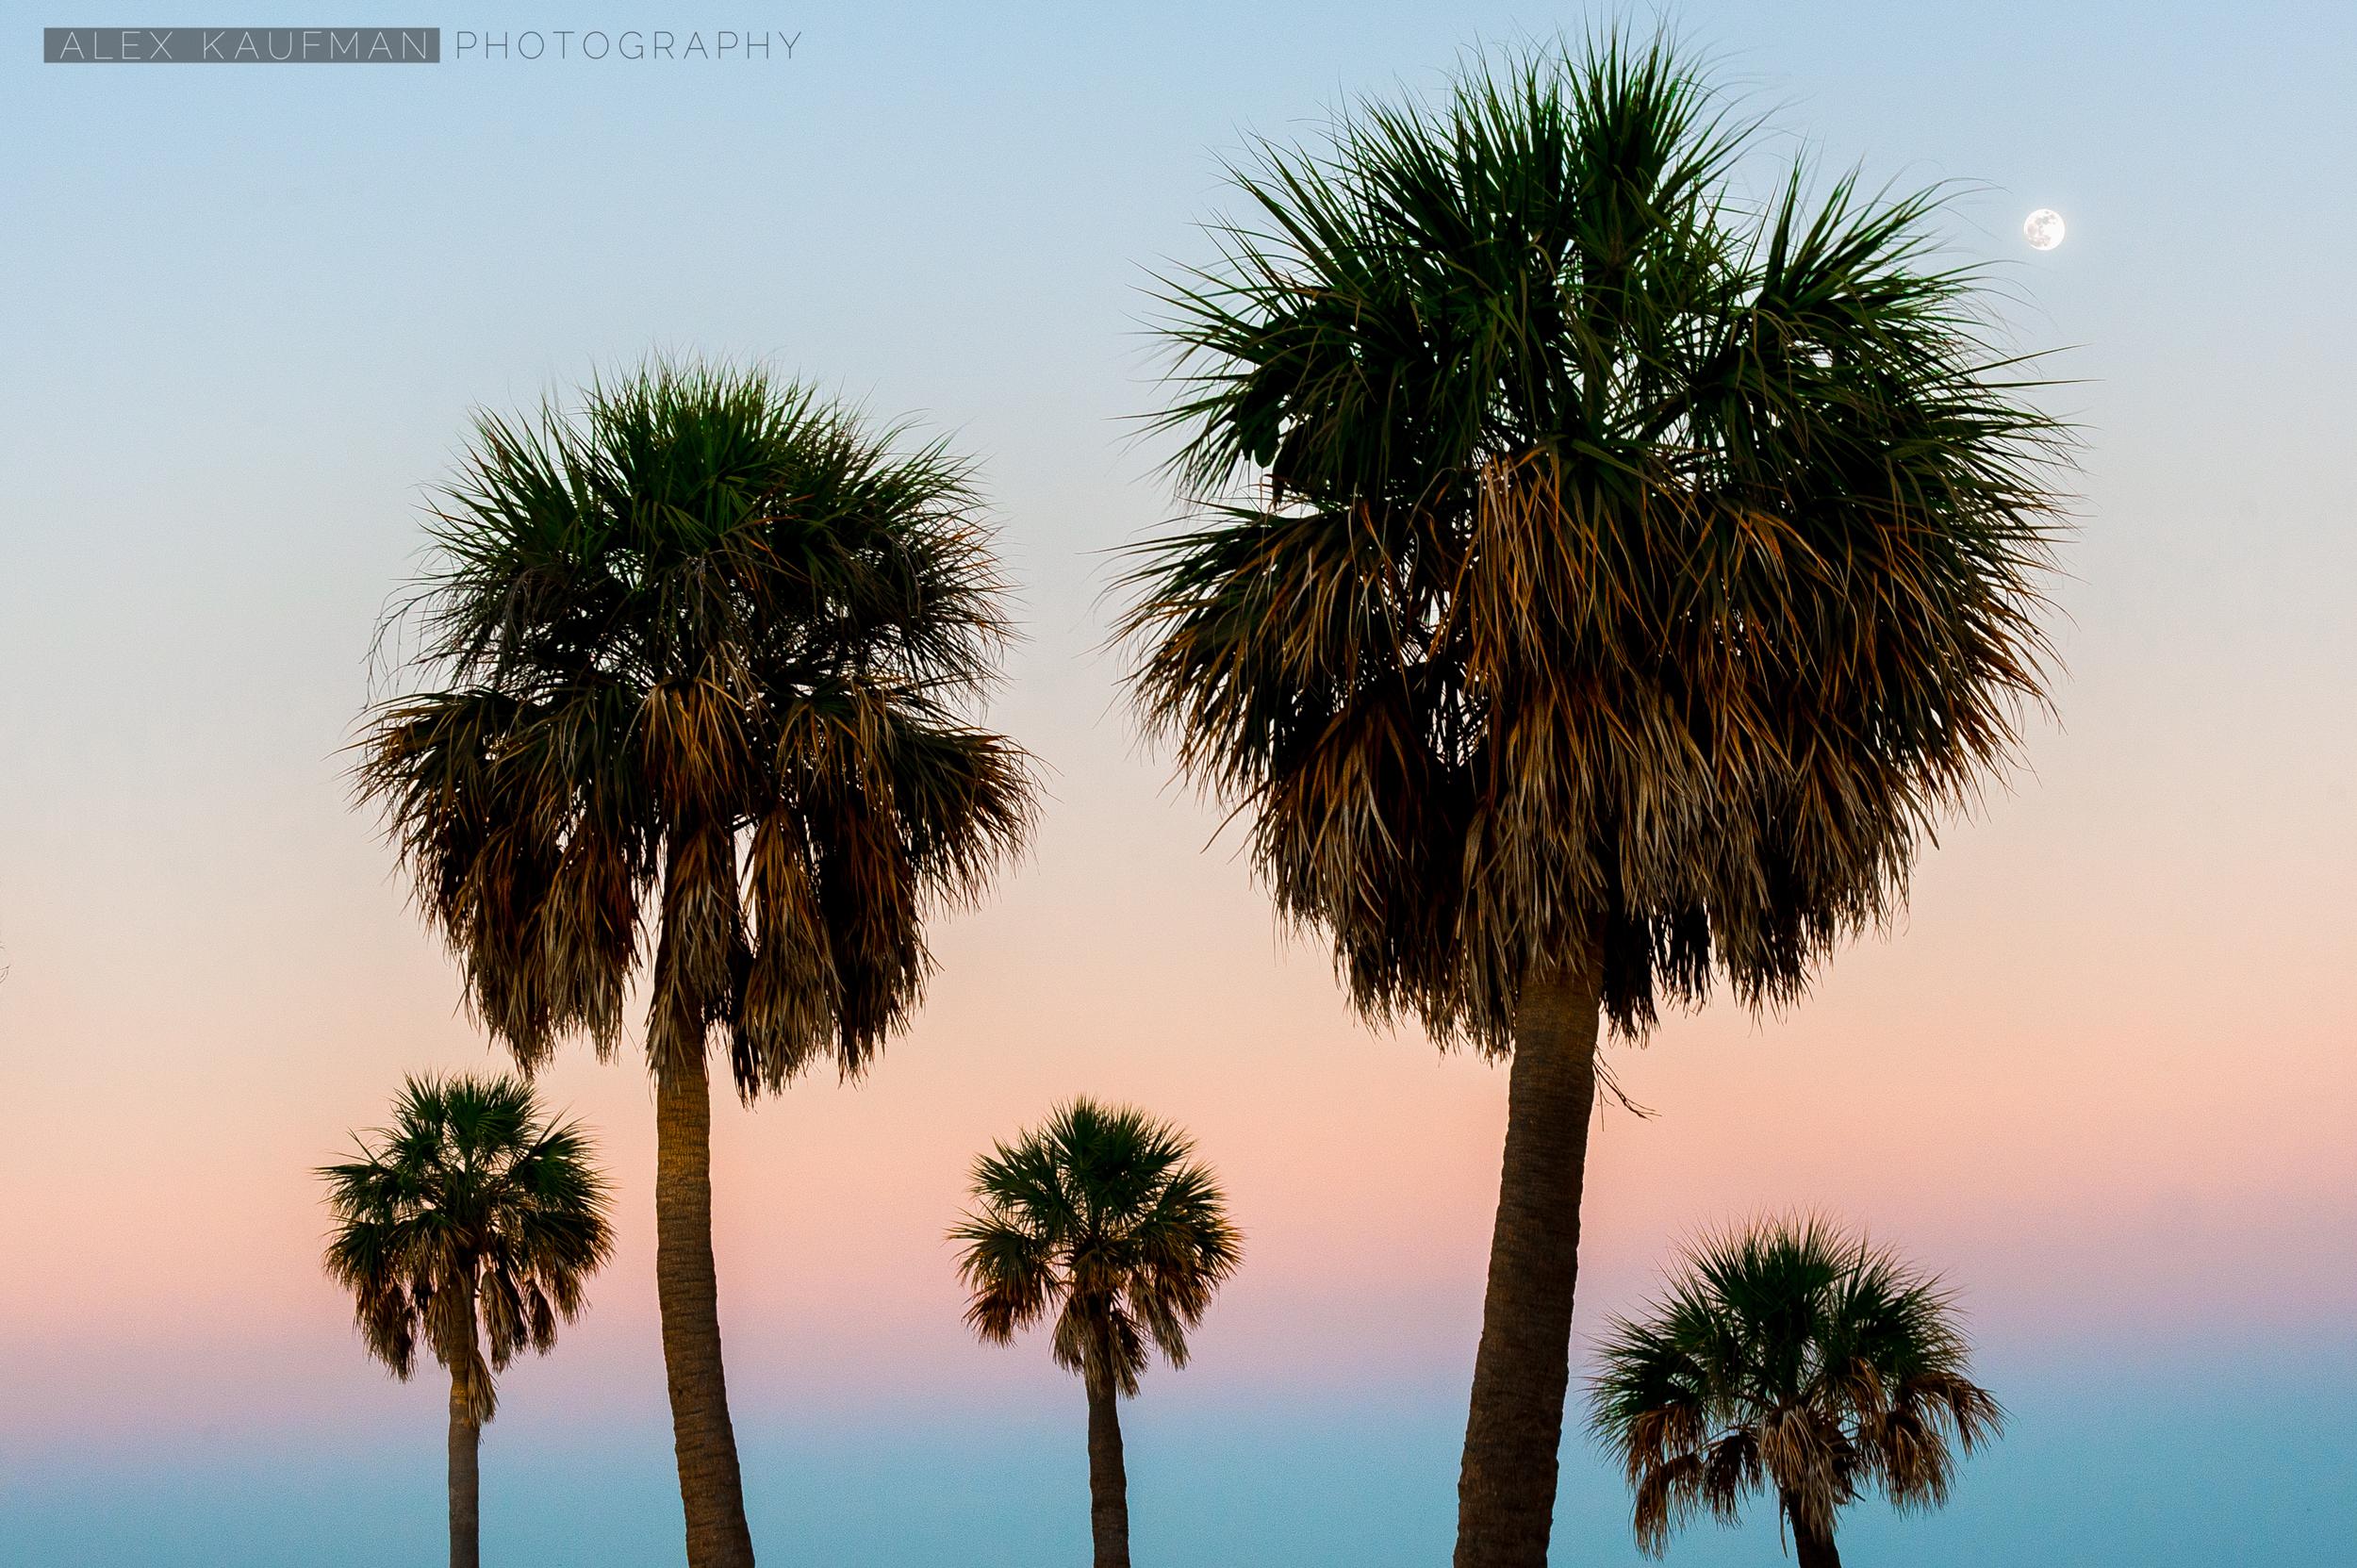 Palm Trees at Twilight